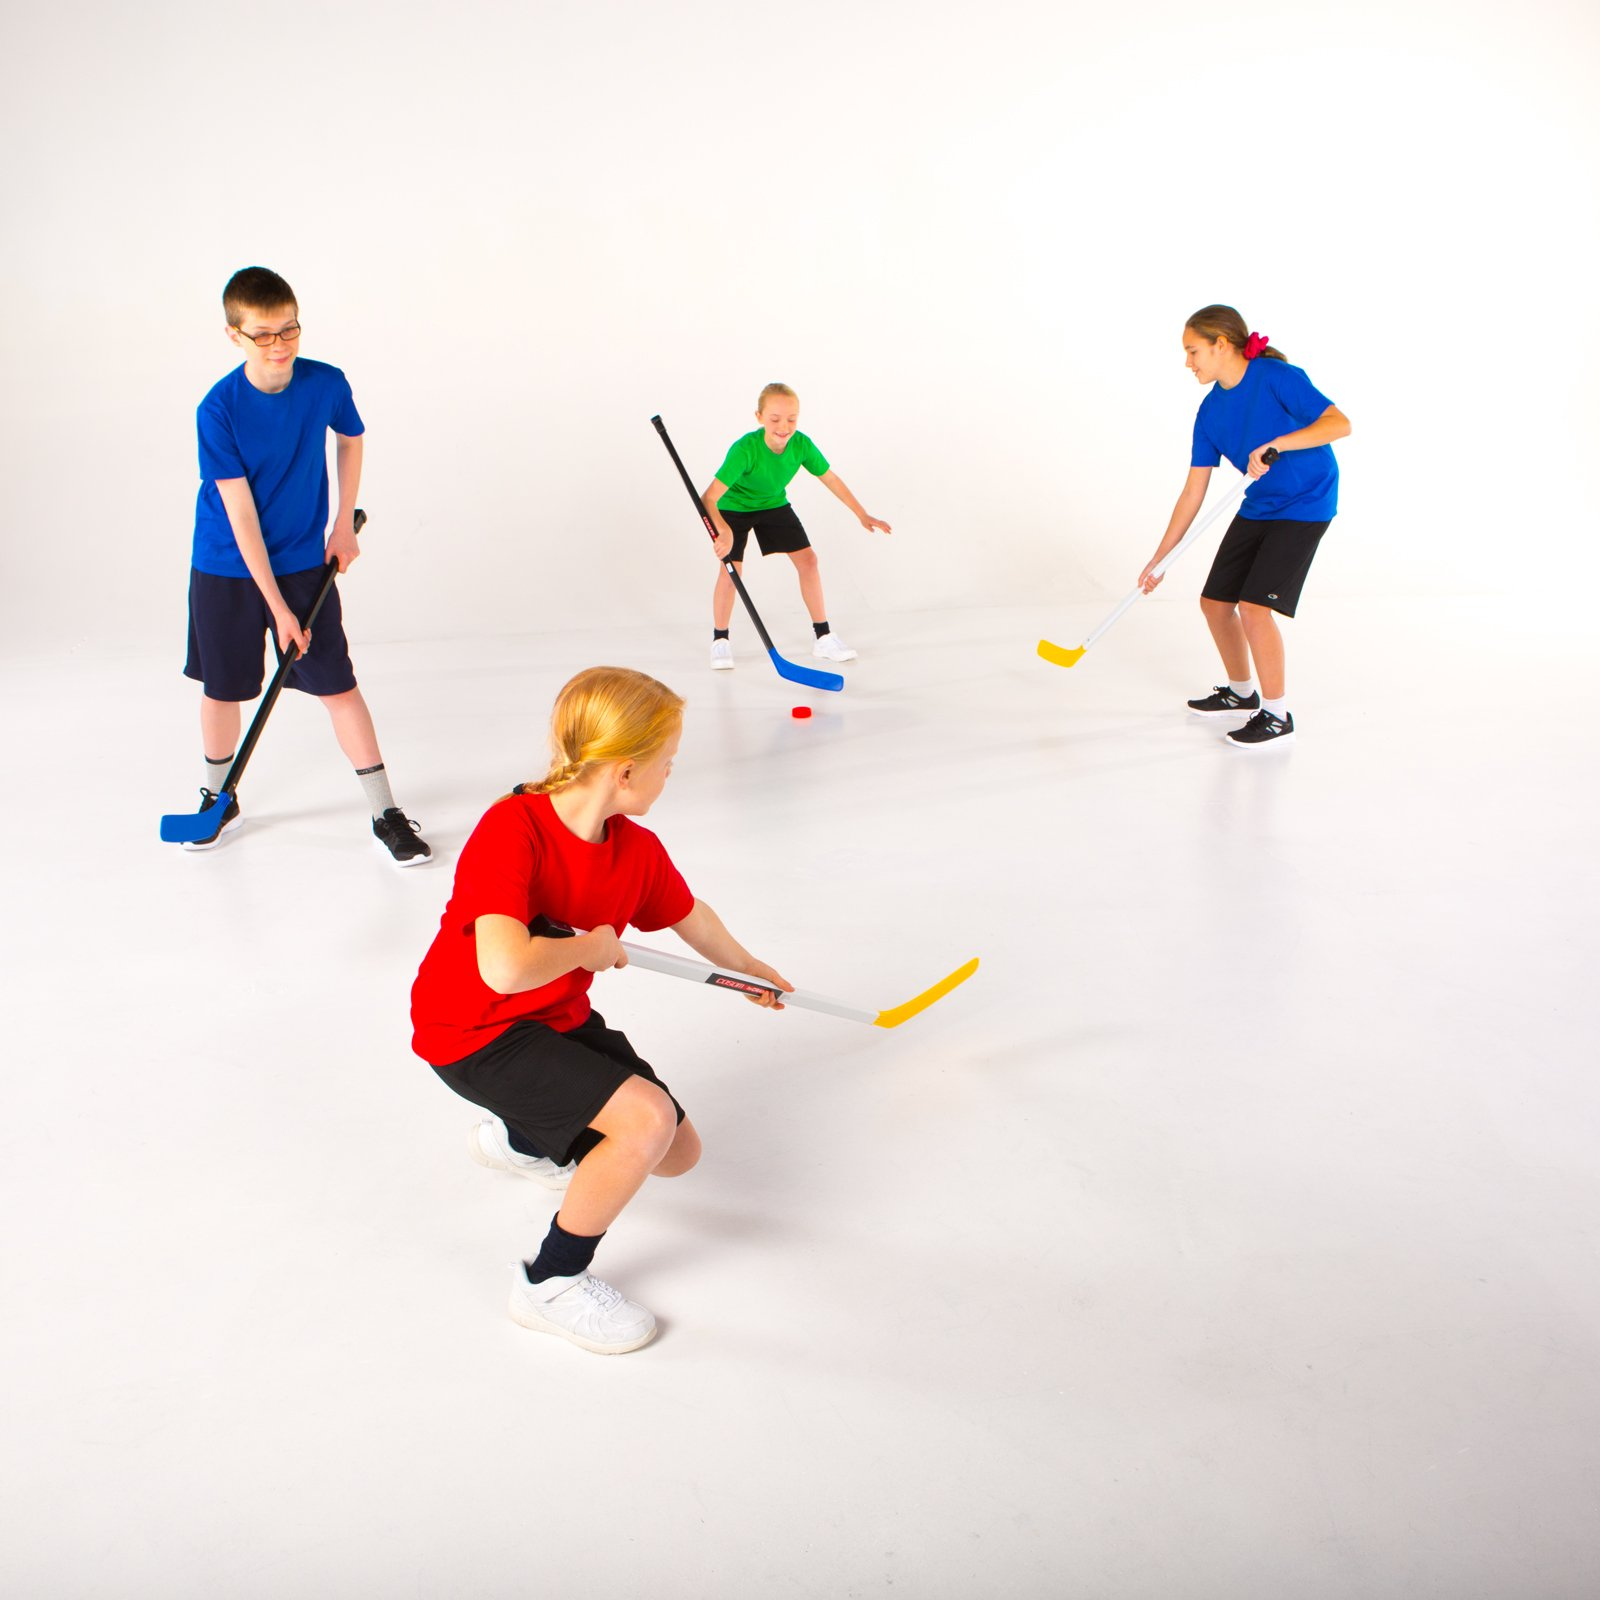 "Cosom Senior Plastic Hockey Sticks for Floor Hockey and Street Hockey, High School Physical Education Equipment, Plastic Hockey Equipment for Practice and Training, 47"" Stick, Standard Shaft, Blue"